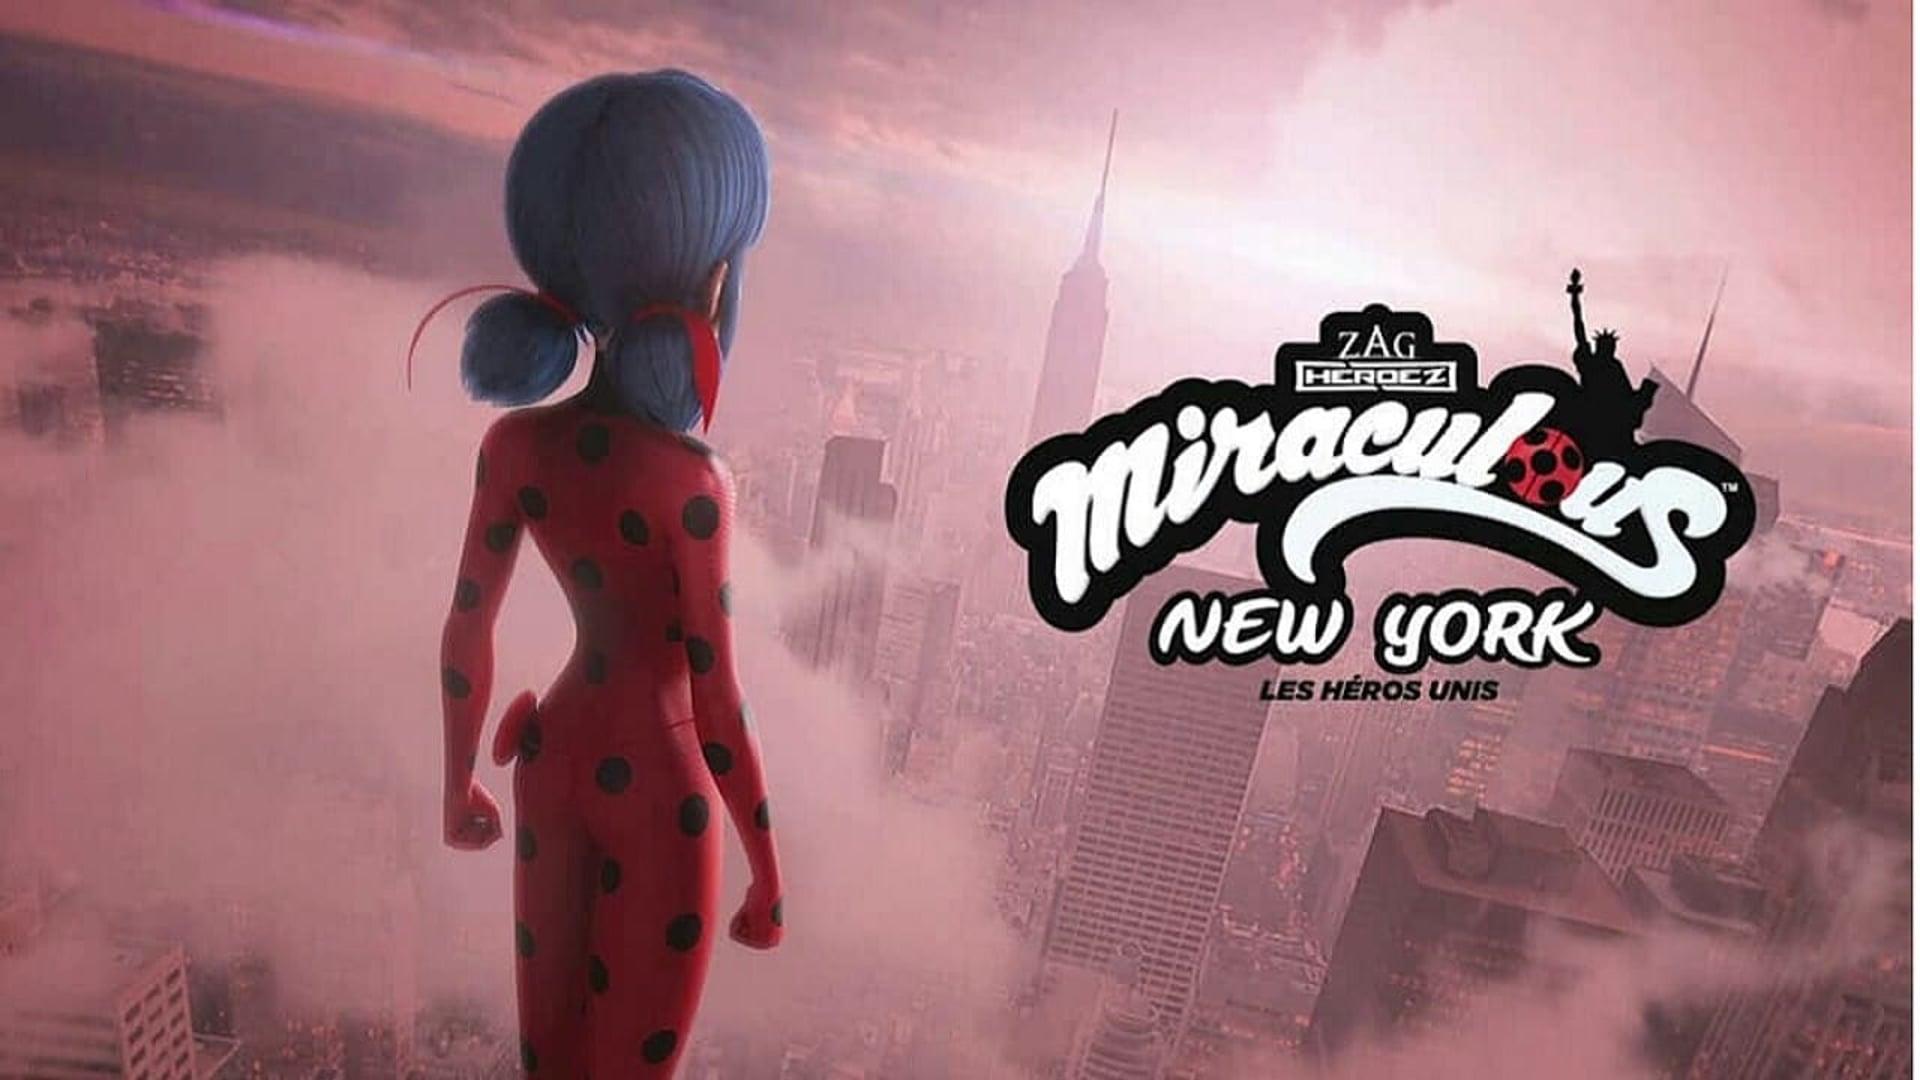 MIRACULOUS - New York, les héros unis